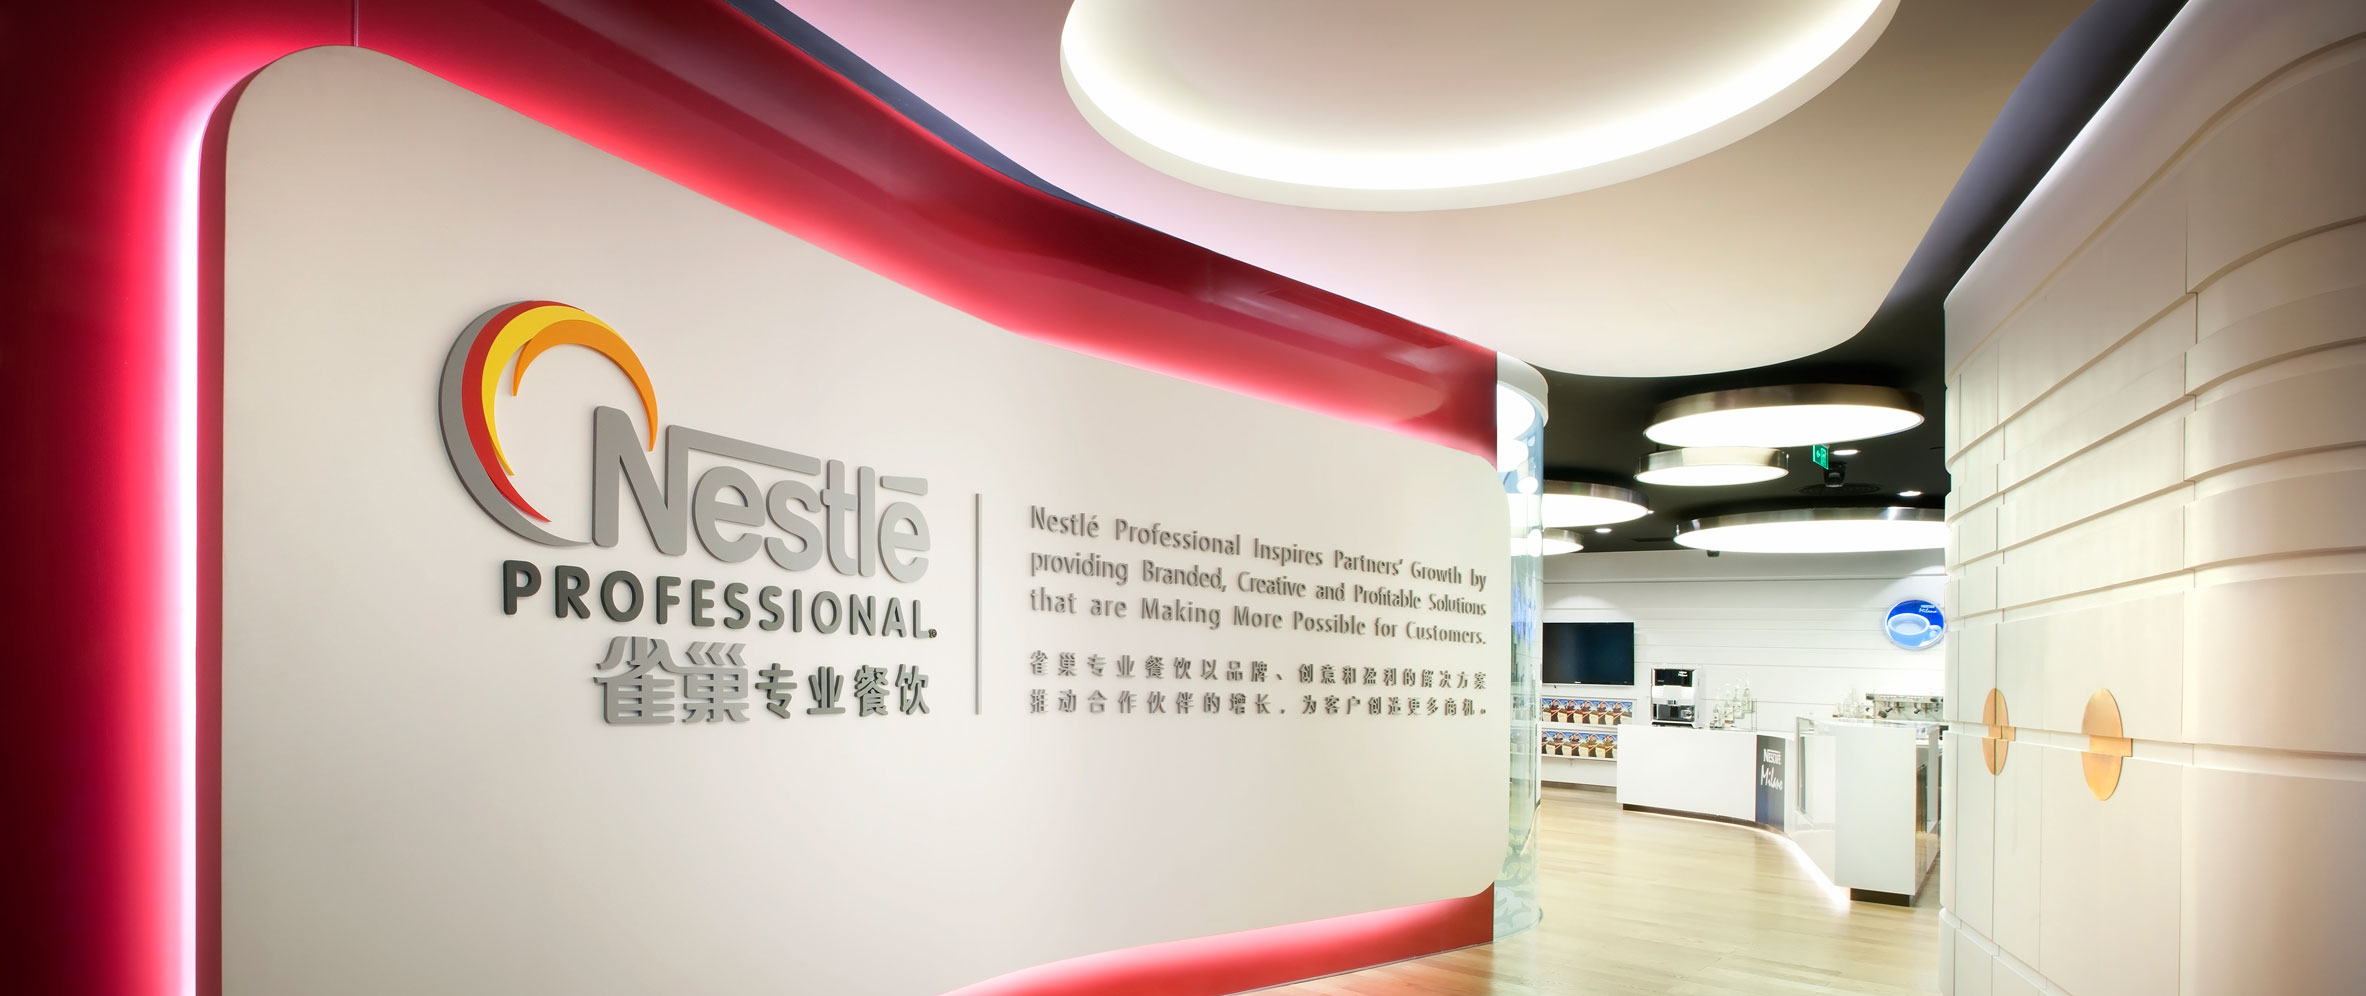 NestleBJC1